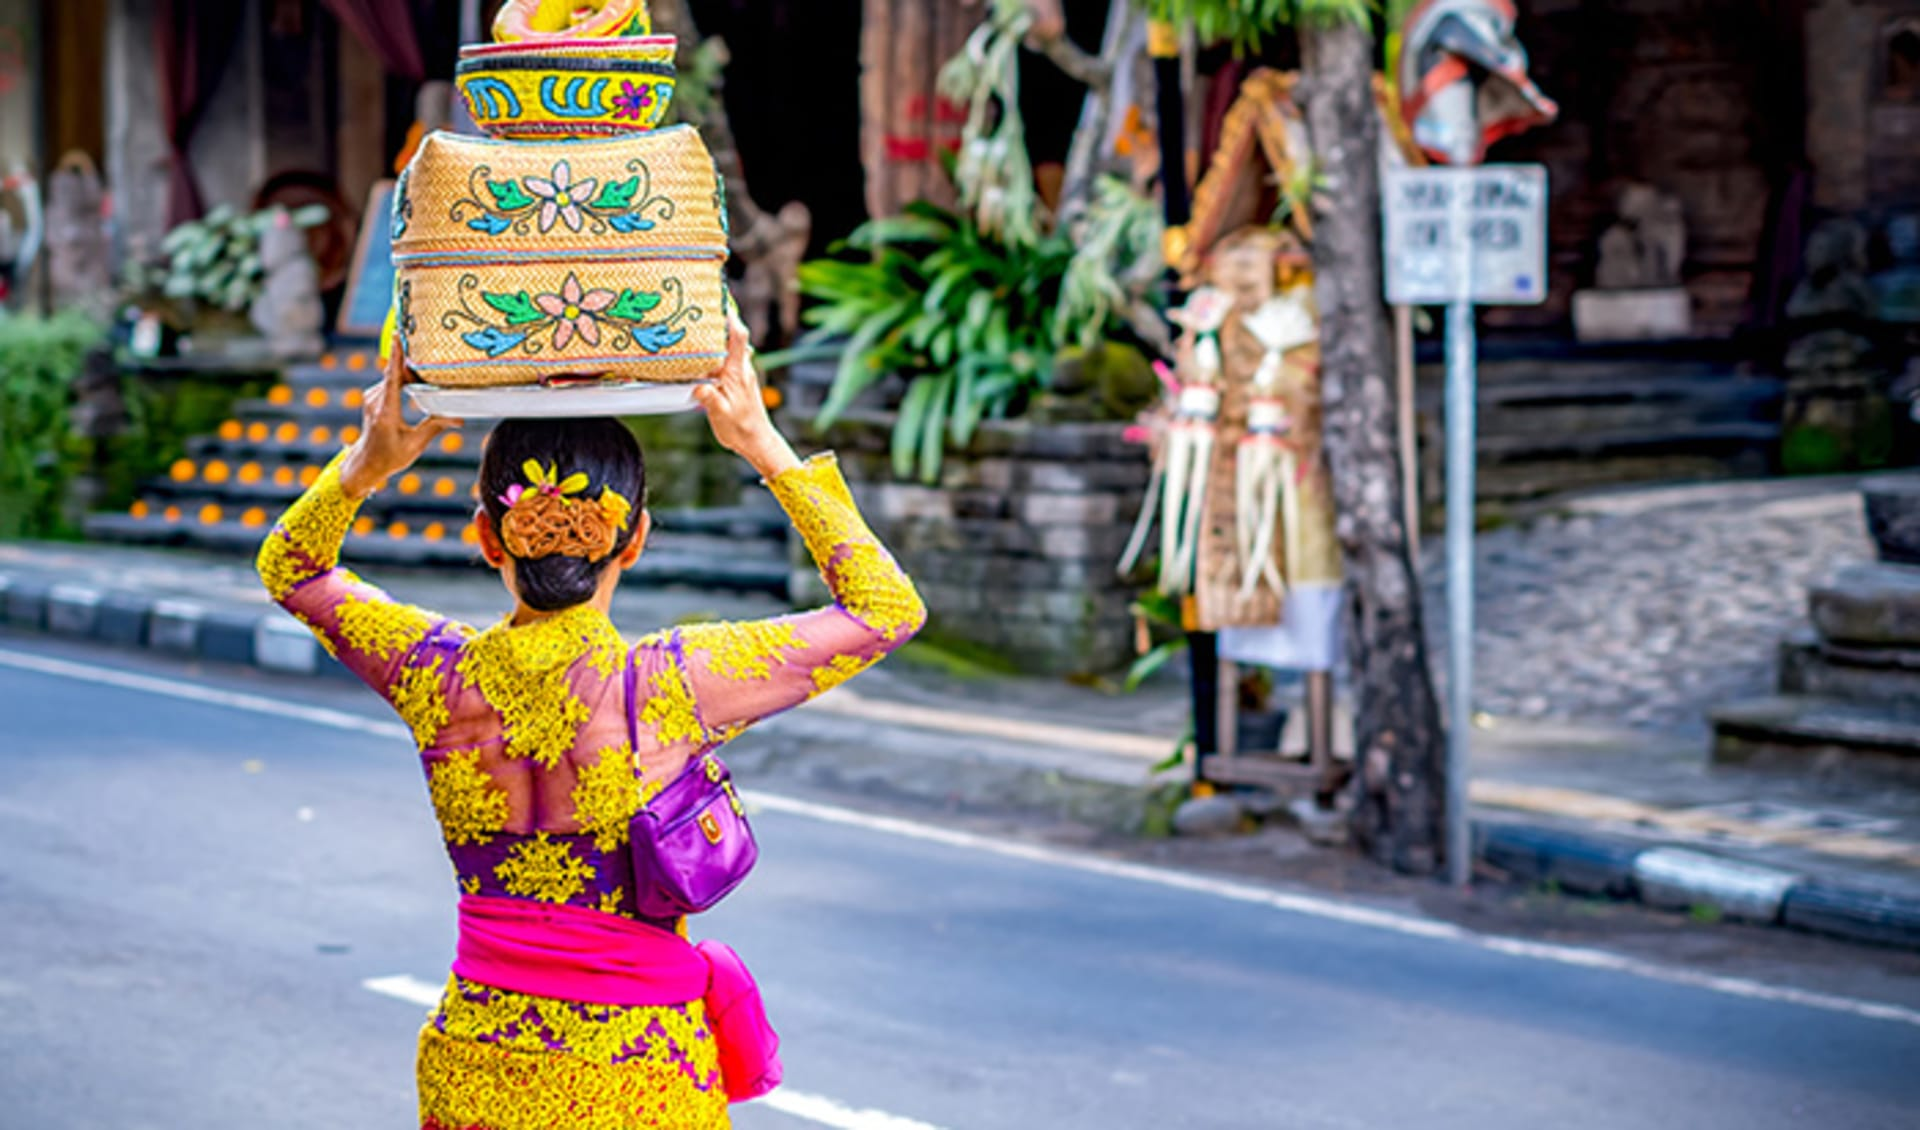 Balinesin, Bali